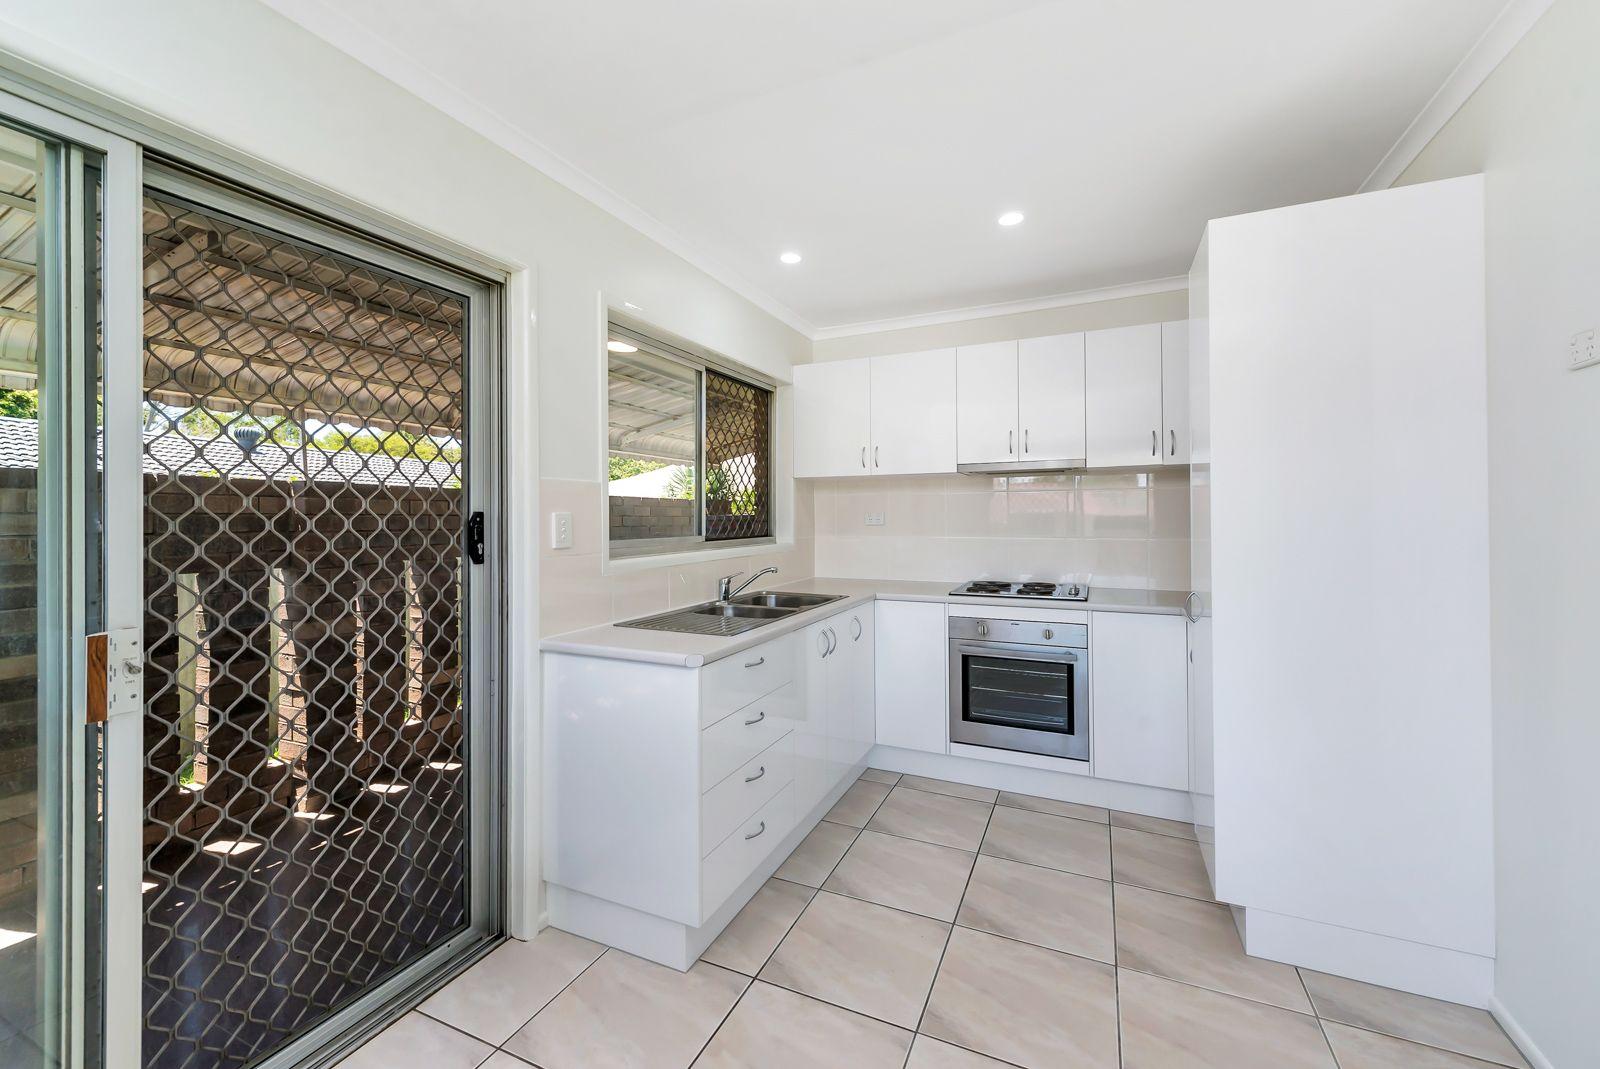 5 Raki Street, Mcdowall QLD 4053, Image 1